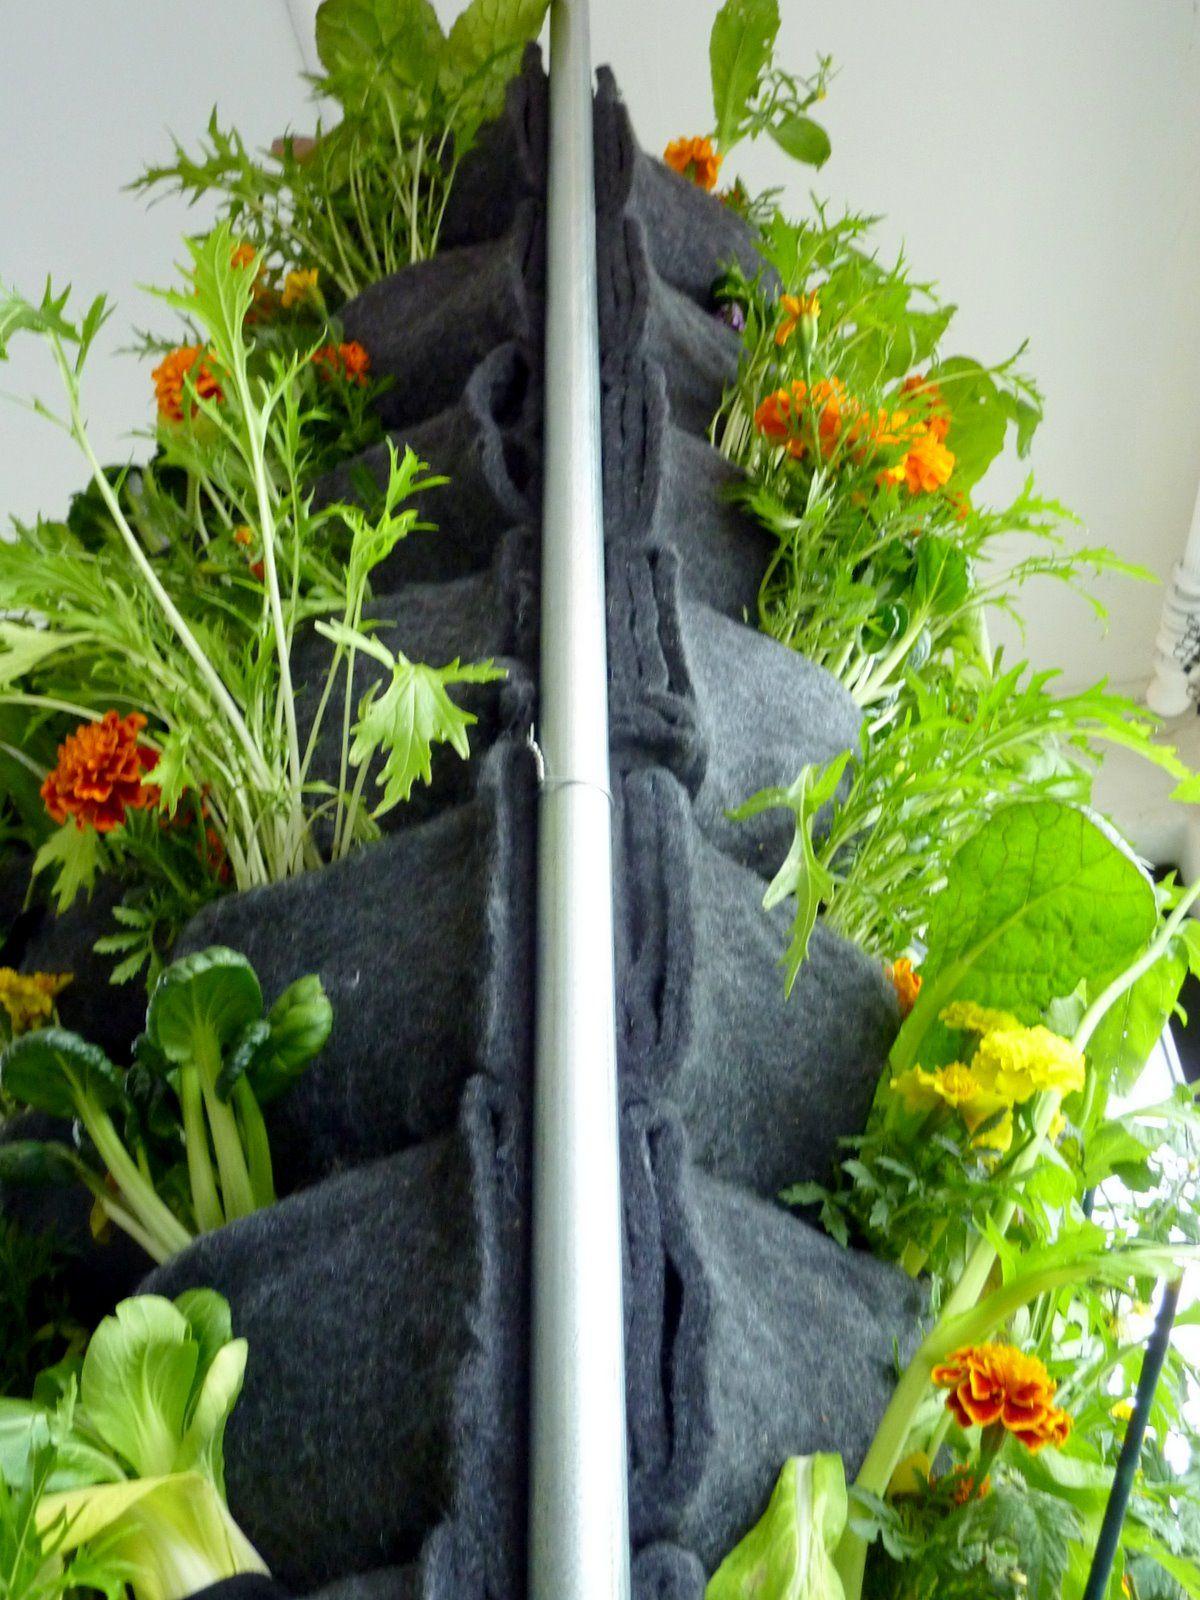 Vertical Vegetable Gardening Ideas Part - 30: Aquaponic Vertical Vegetable Garden | Plants On Walls